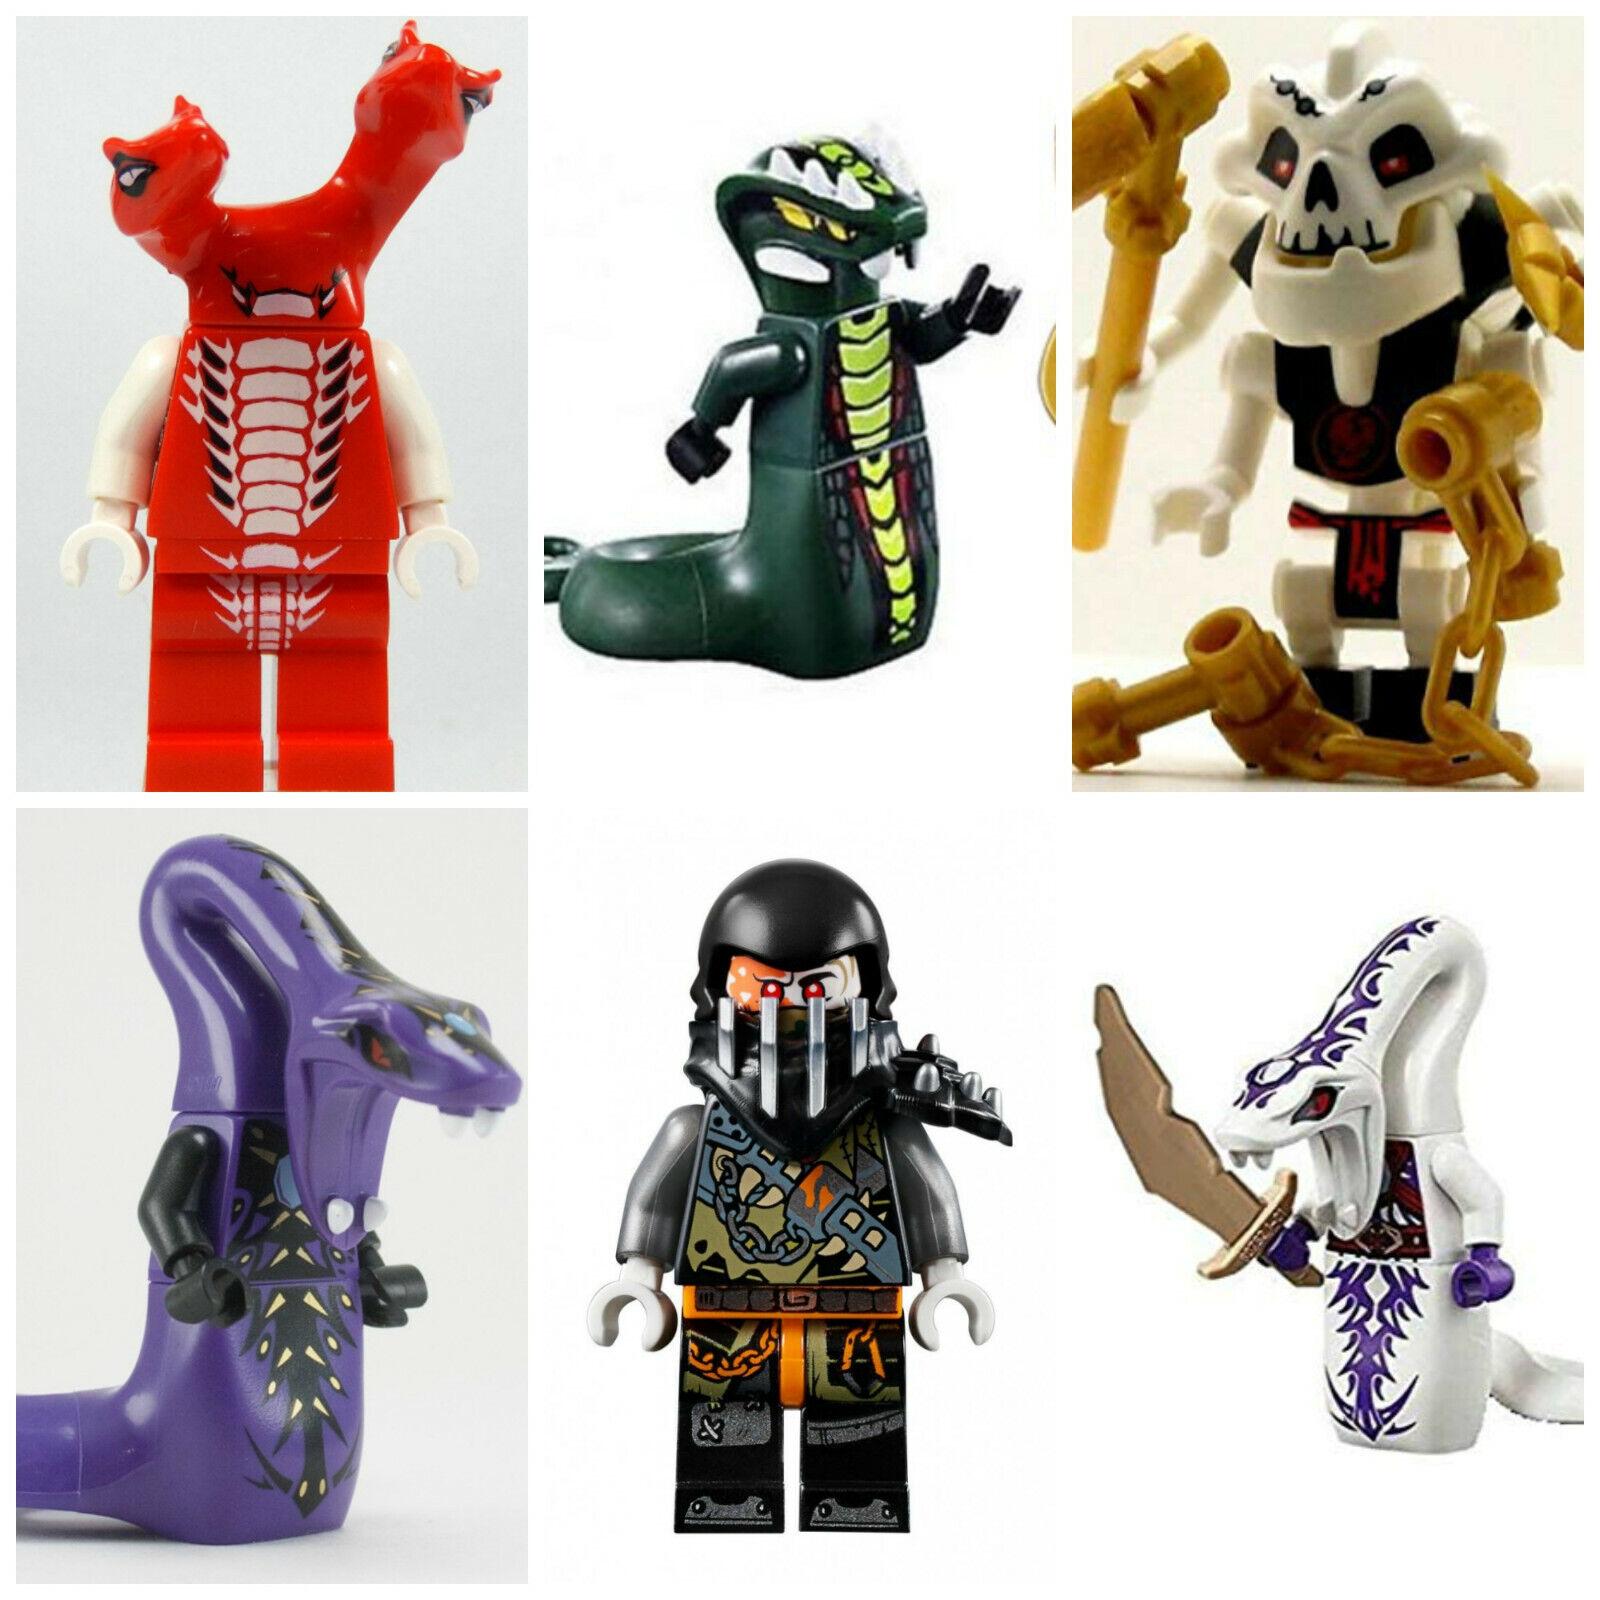 PYTHOR  NINJAGO CLASSIC Lego Movie  COLLECTORS PHOTOS GARMADON TRIBES